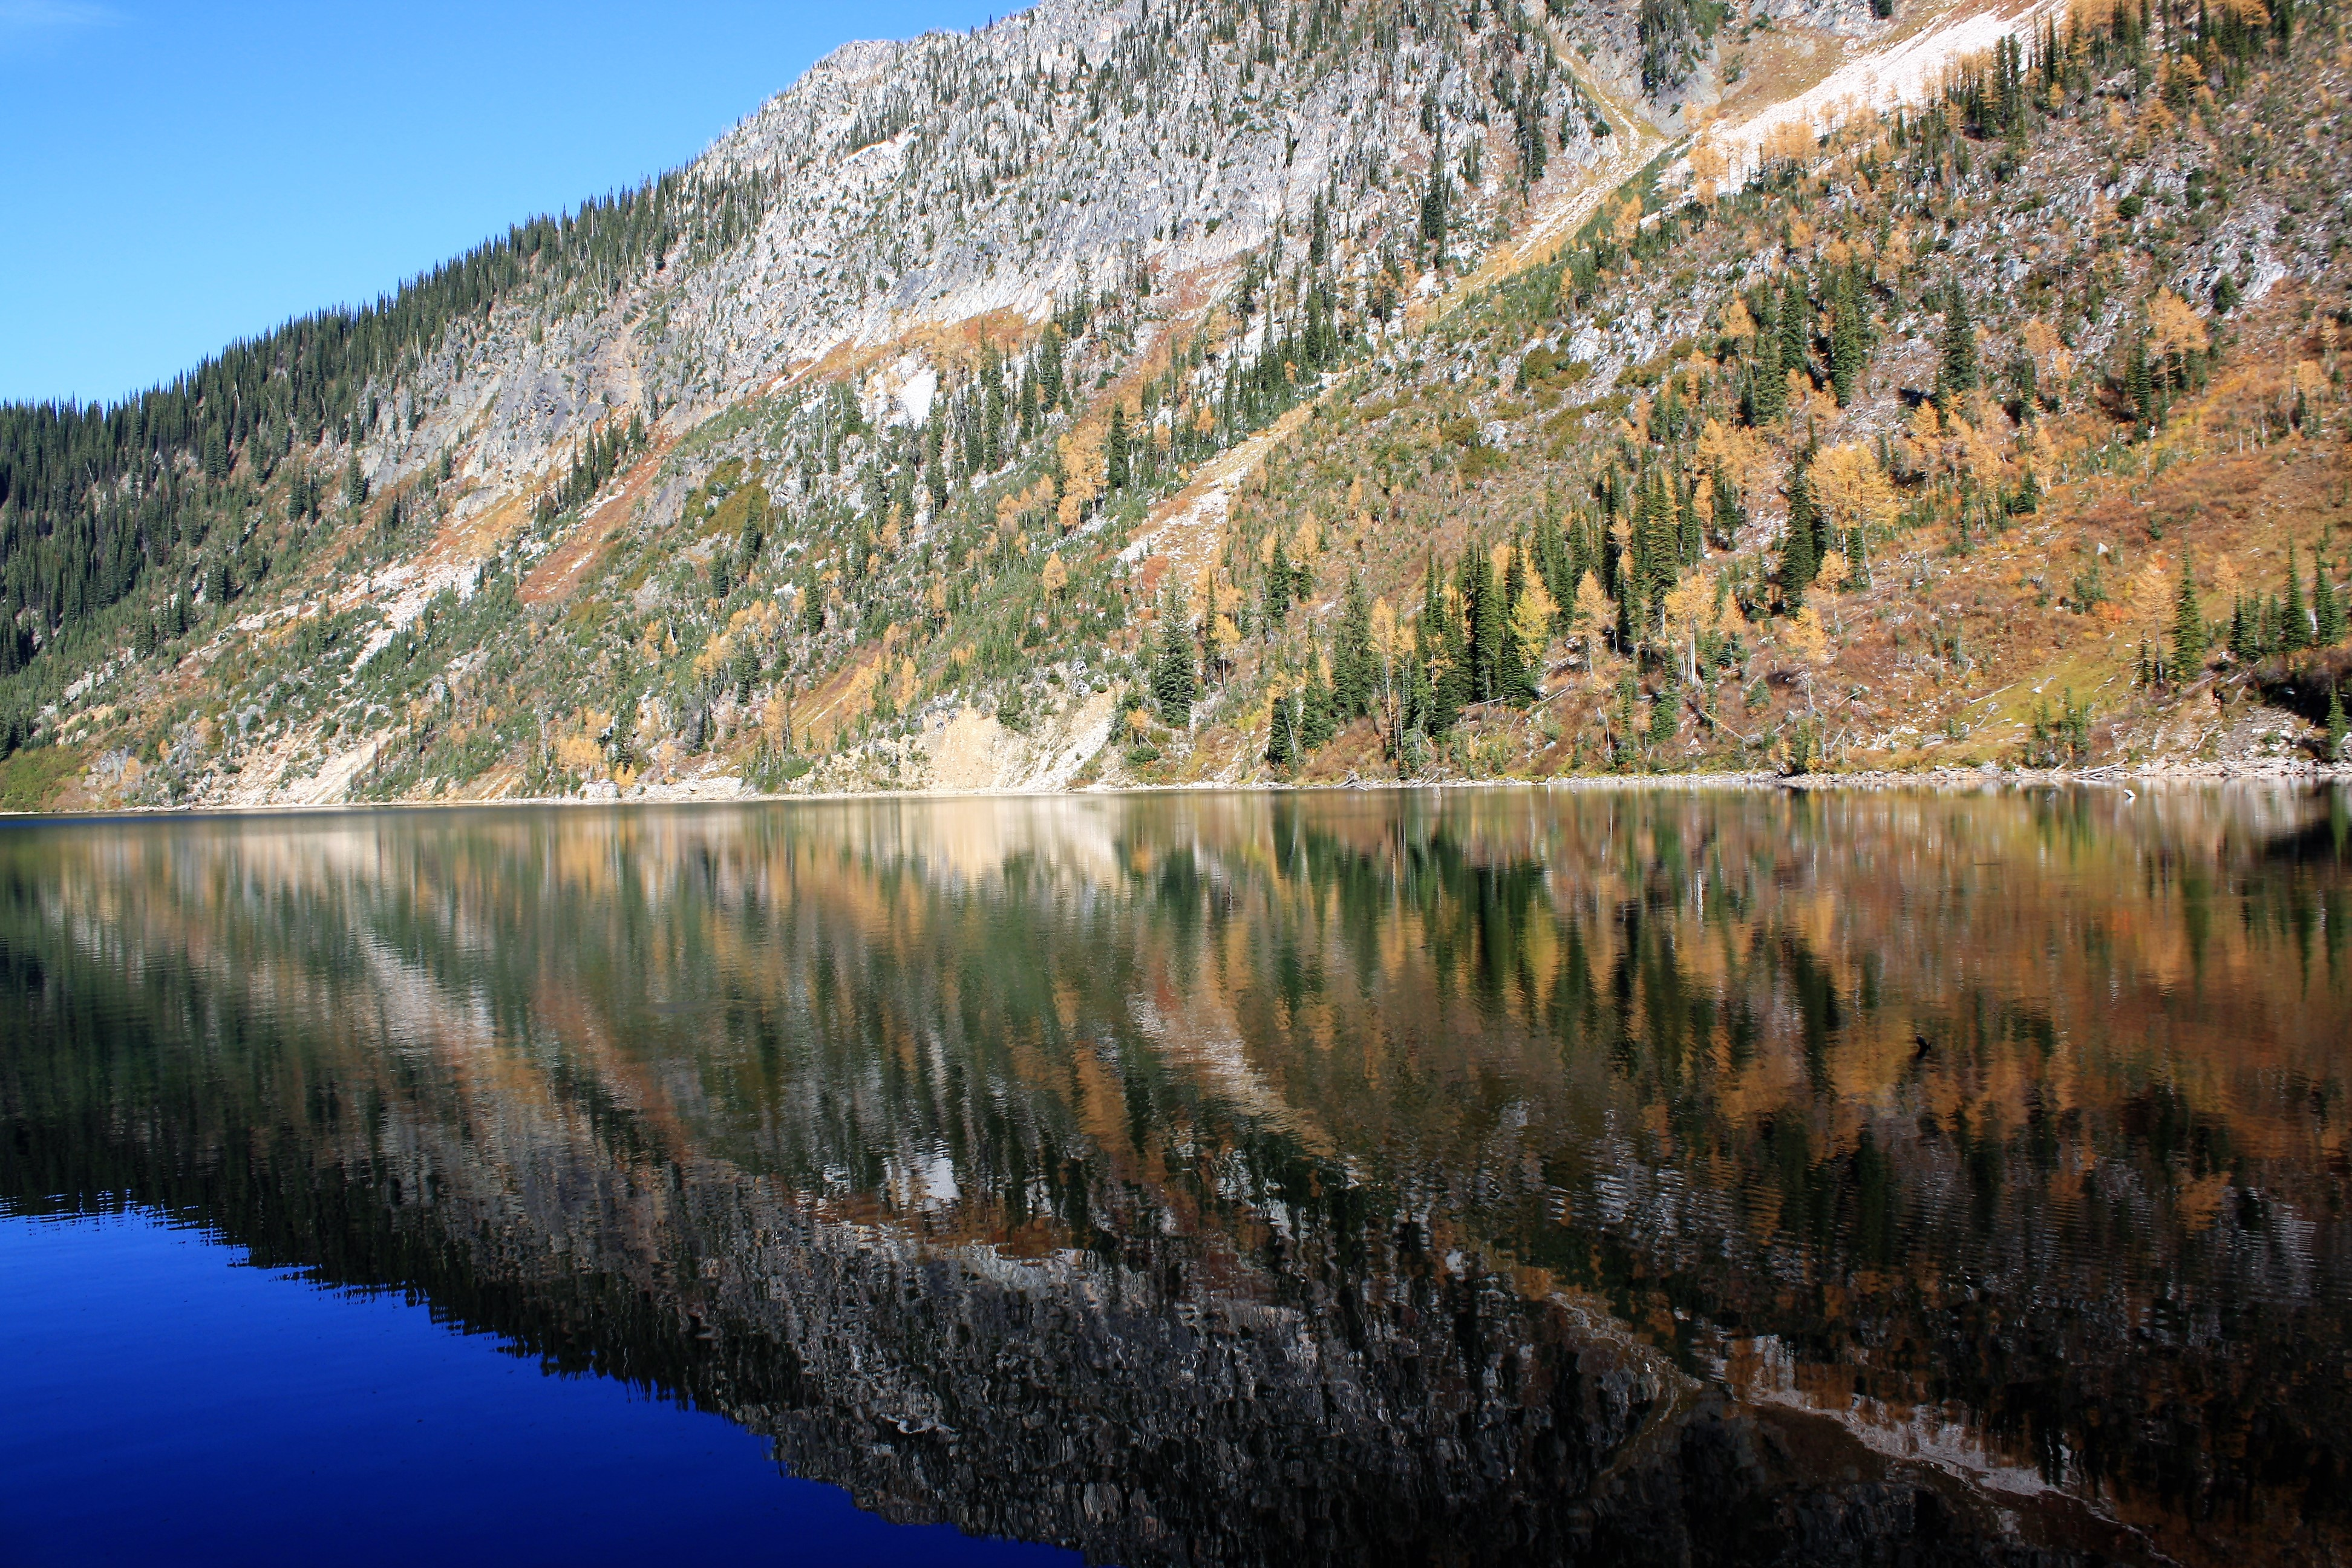 DM_nature_landscape_plaidlake_0485